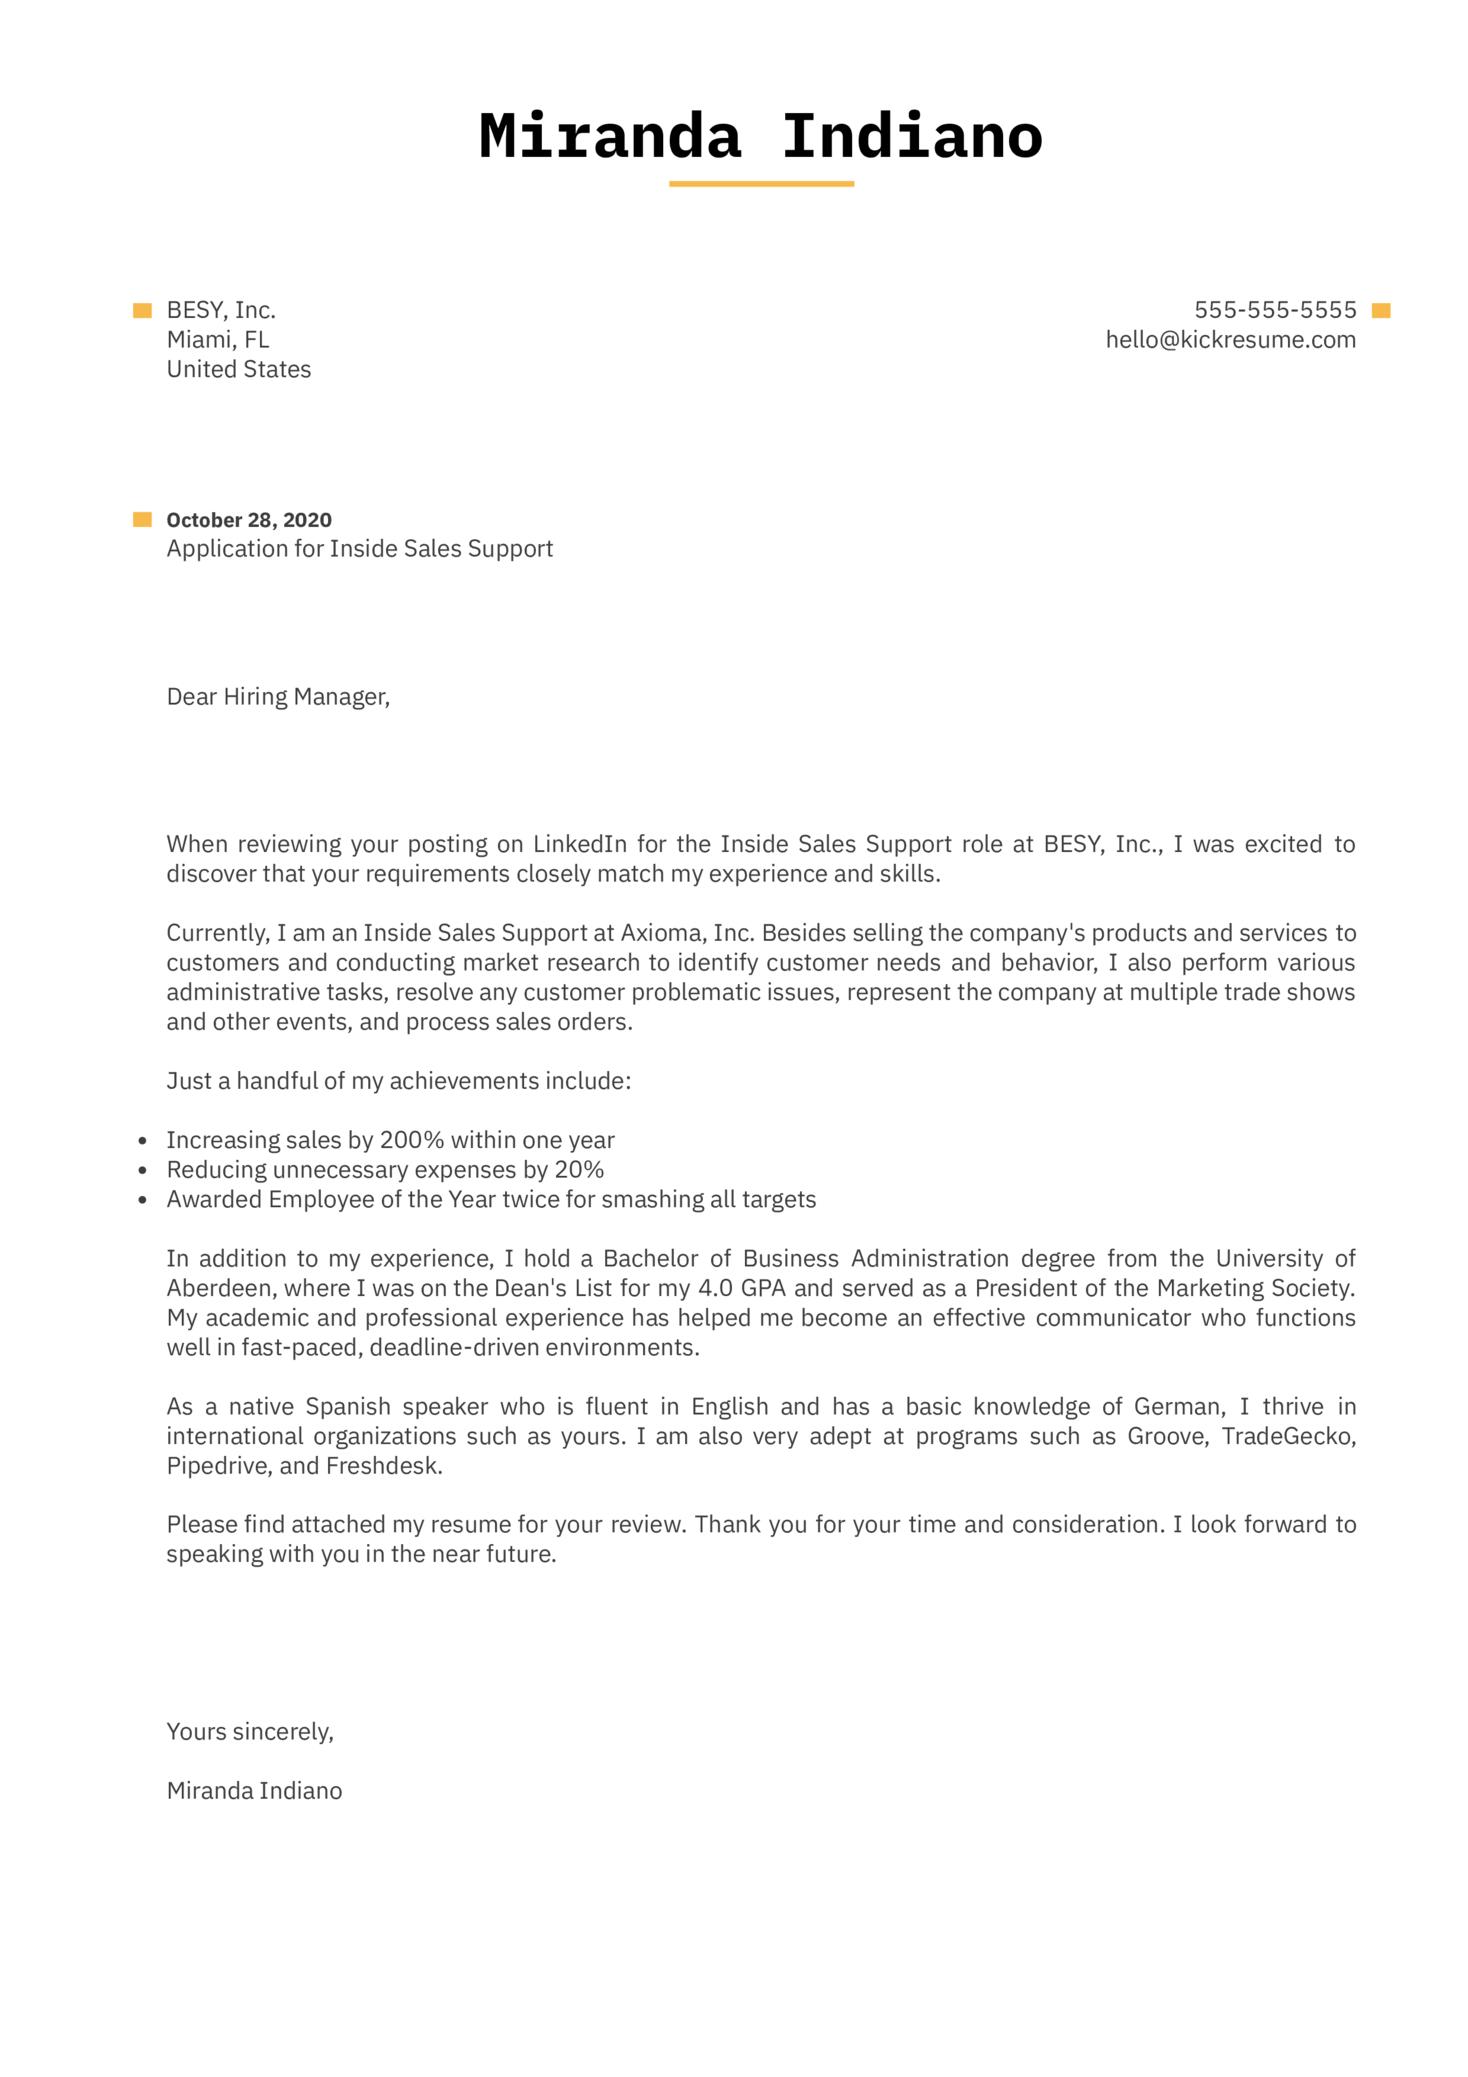 Inside Sales Support Cover Letter Sample